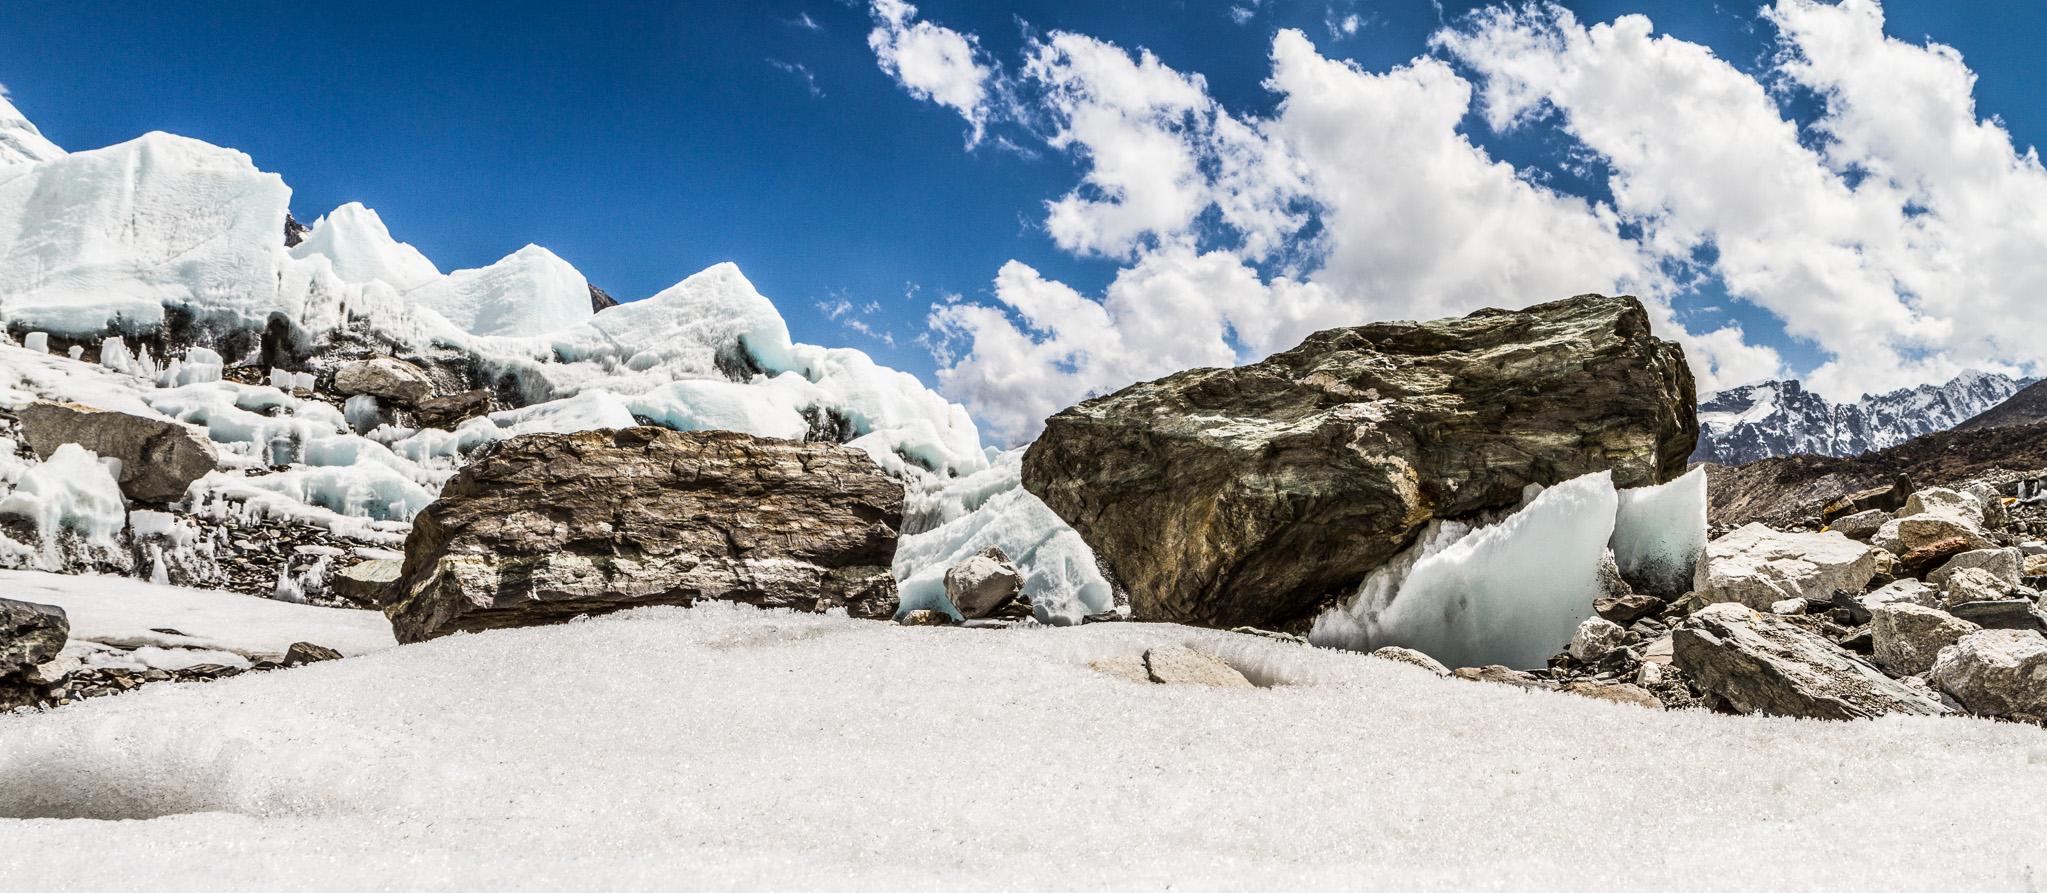 Ali-Barqawi-Studios-Travel-Adventure-Photo-Nepal-Everest-2014-Ep